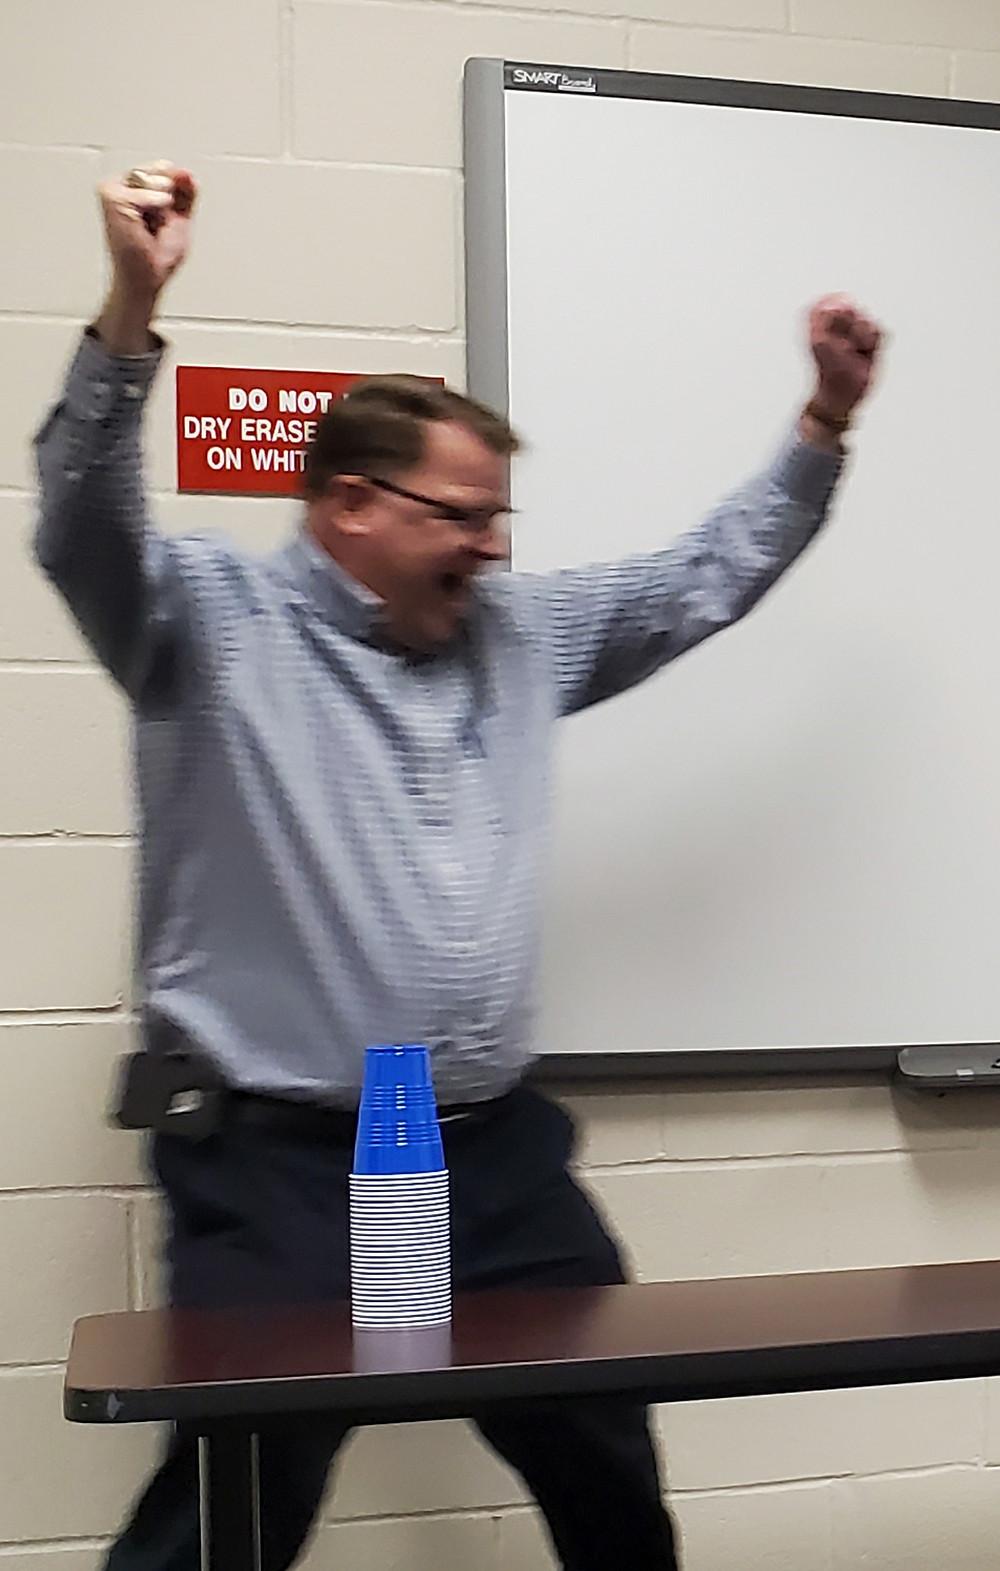 Jeff Heye Wins the Game